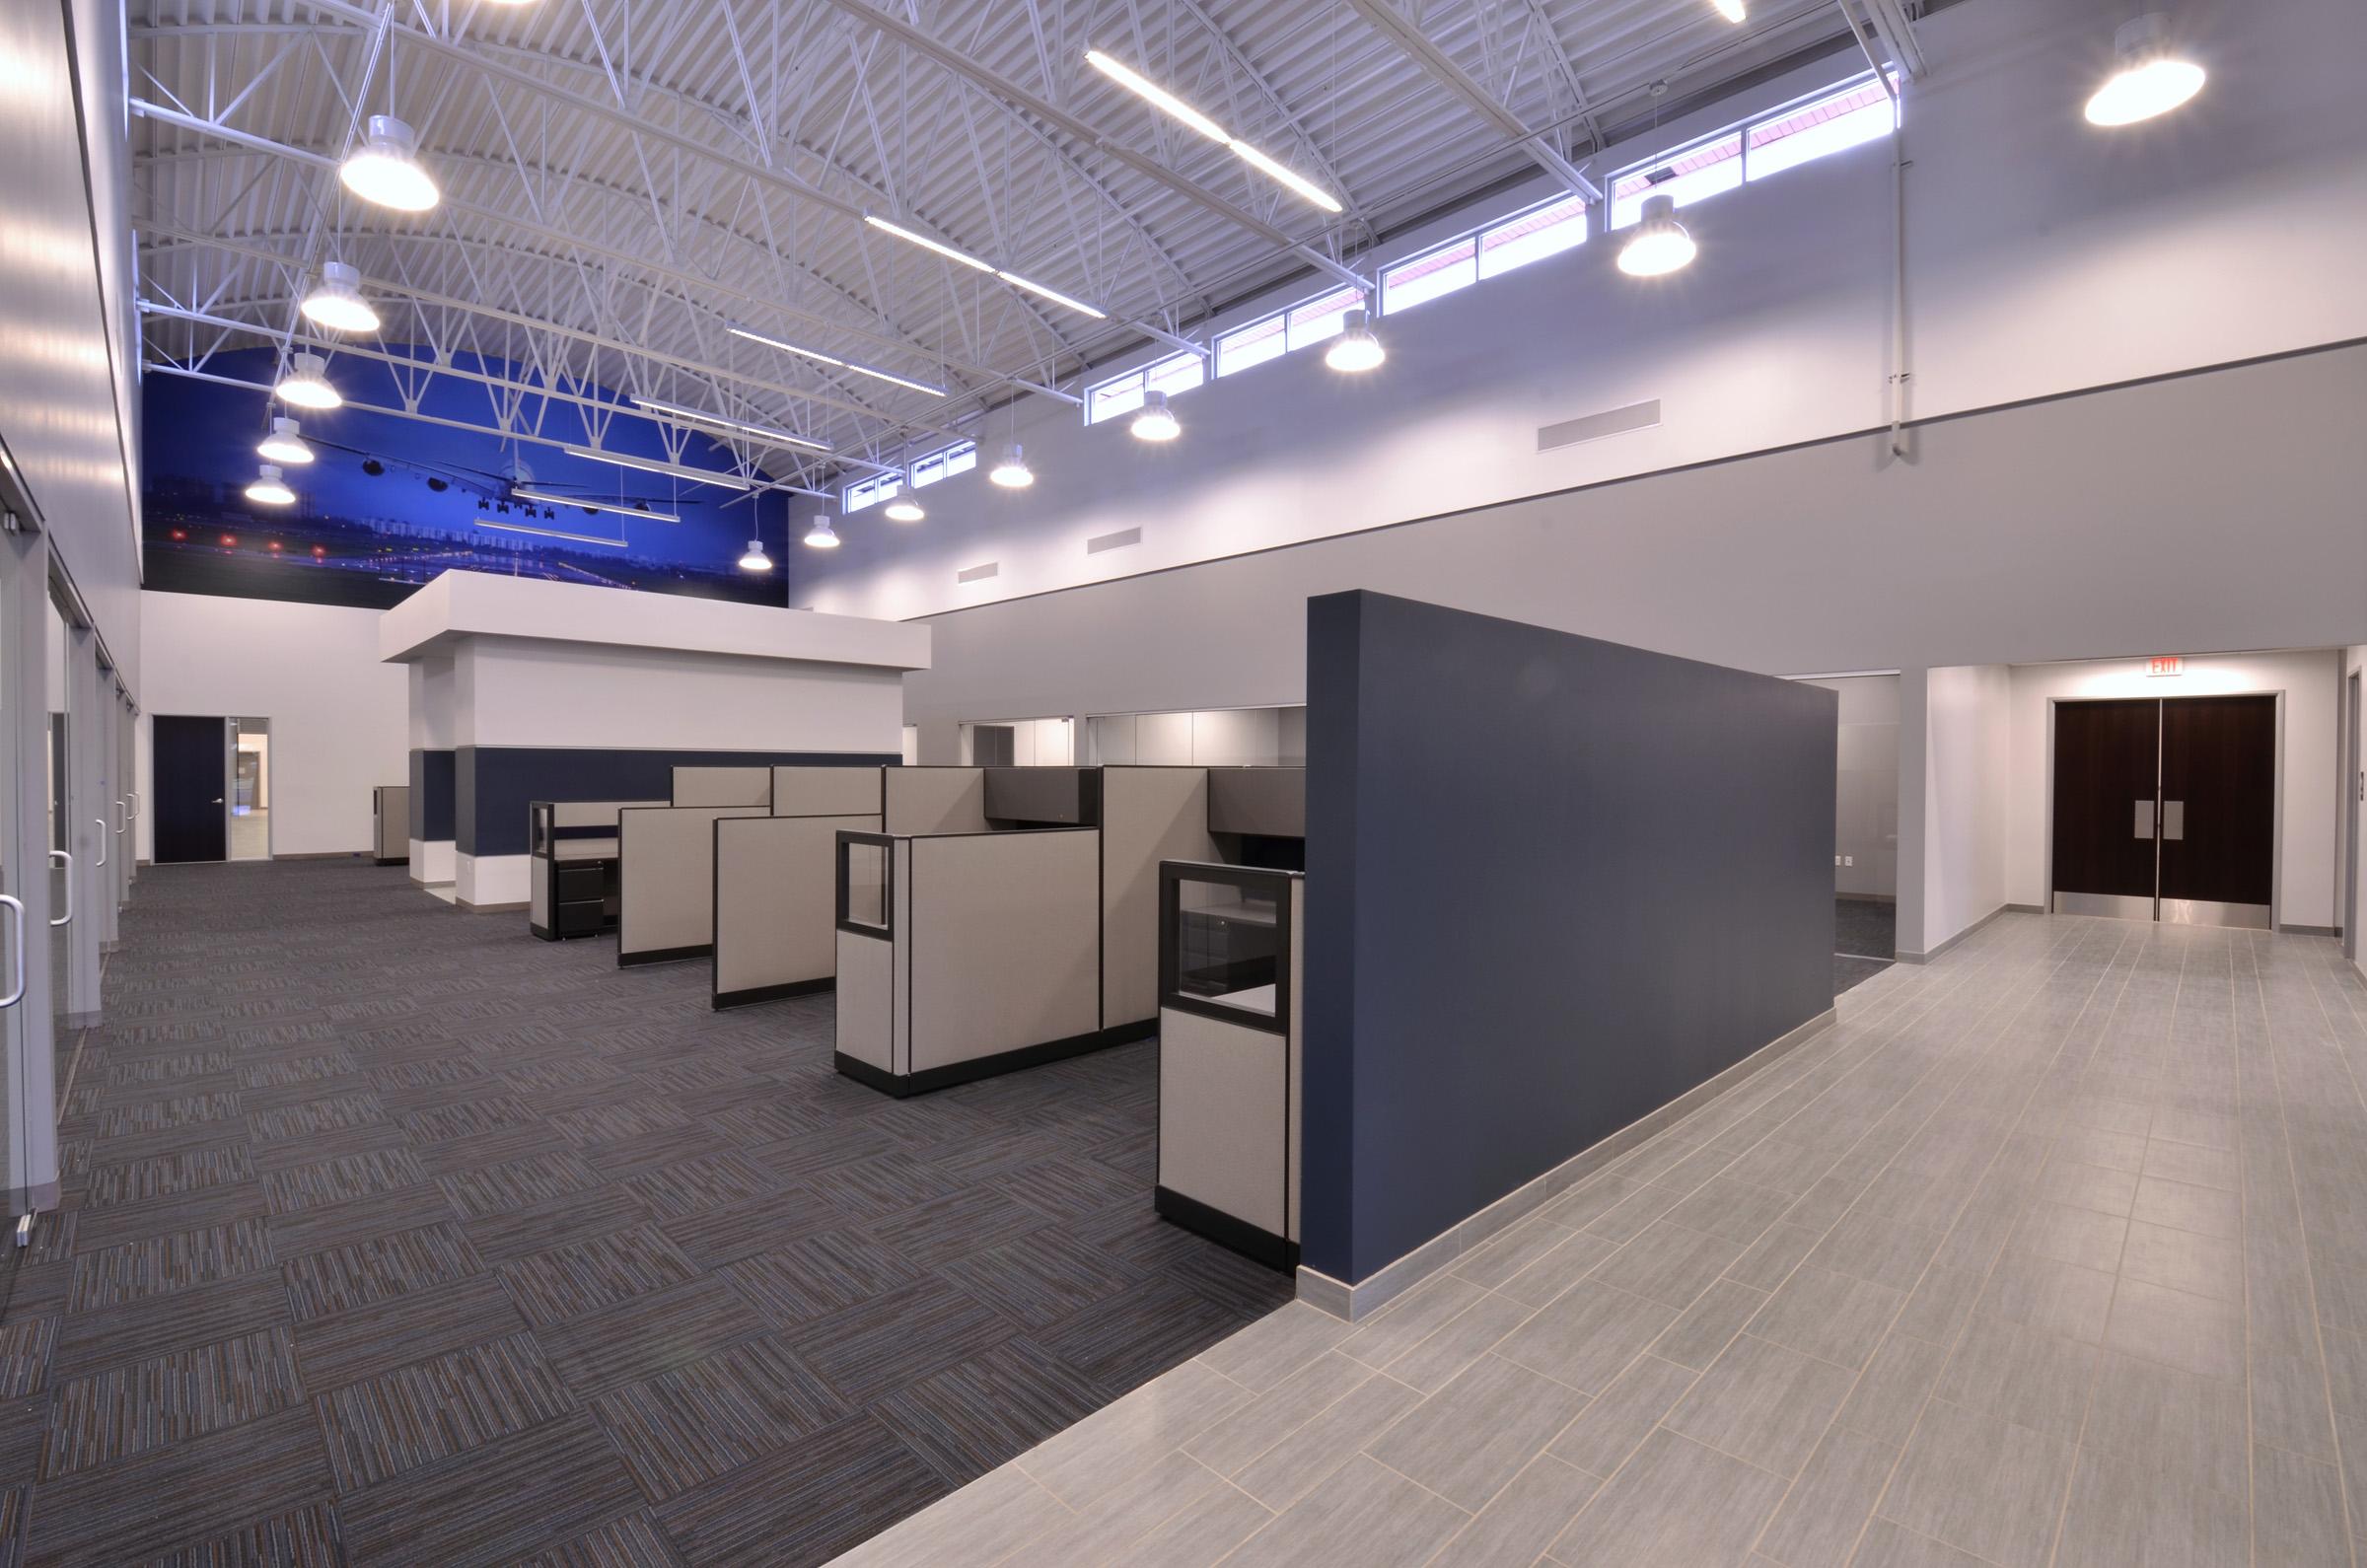 ATC Interior Cubicles